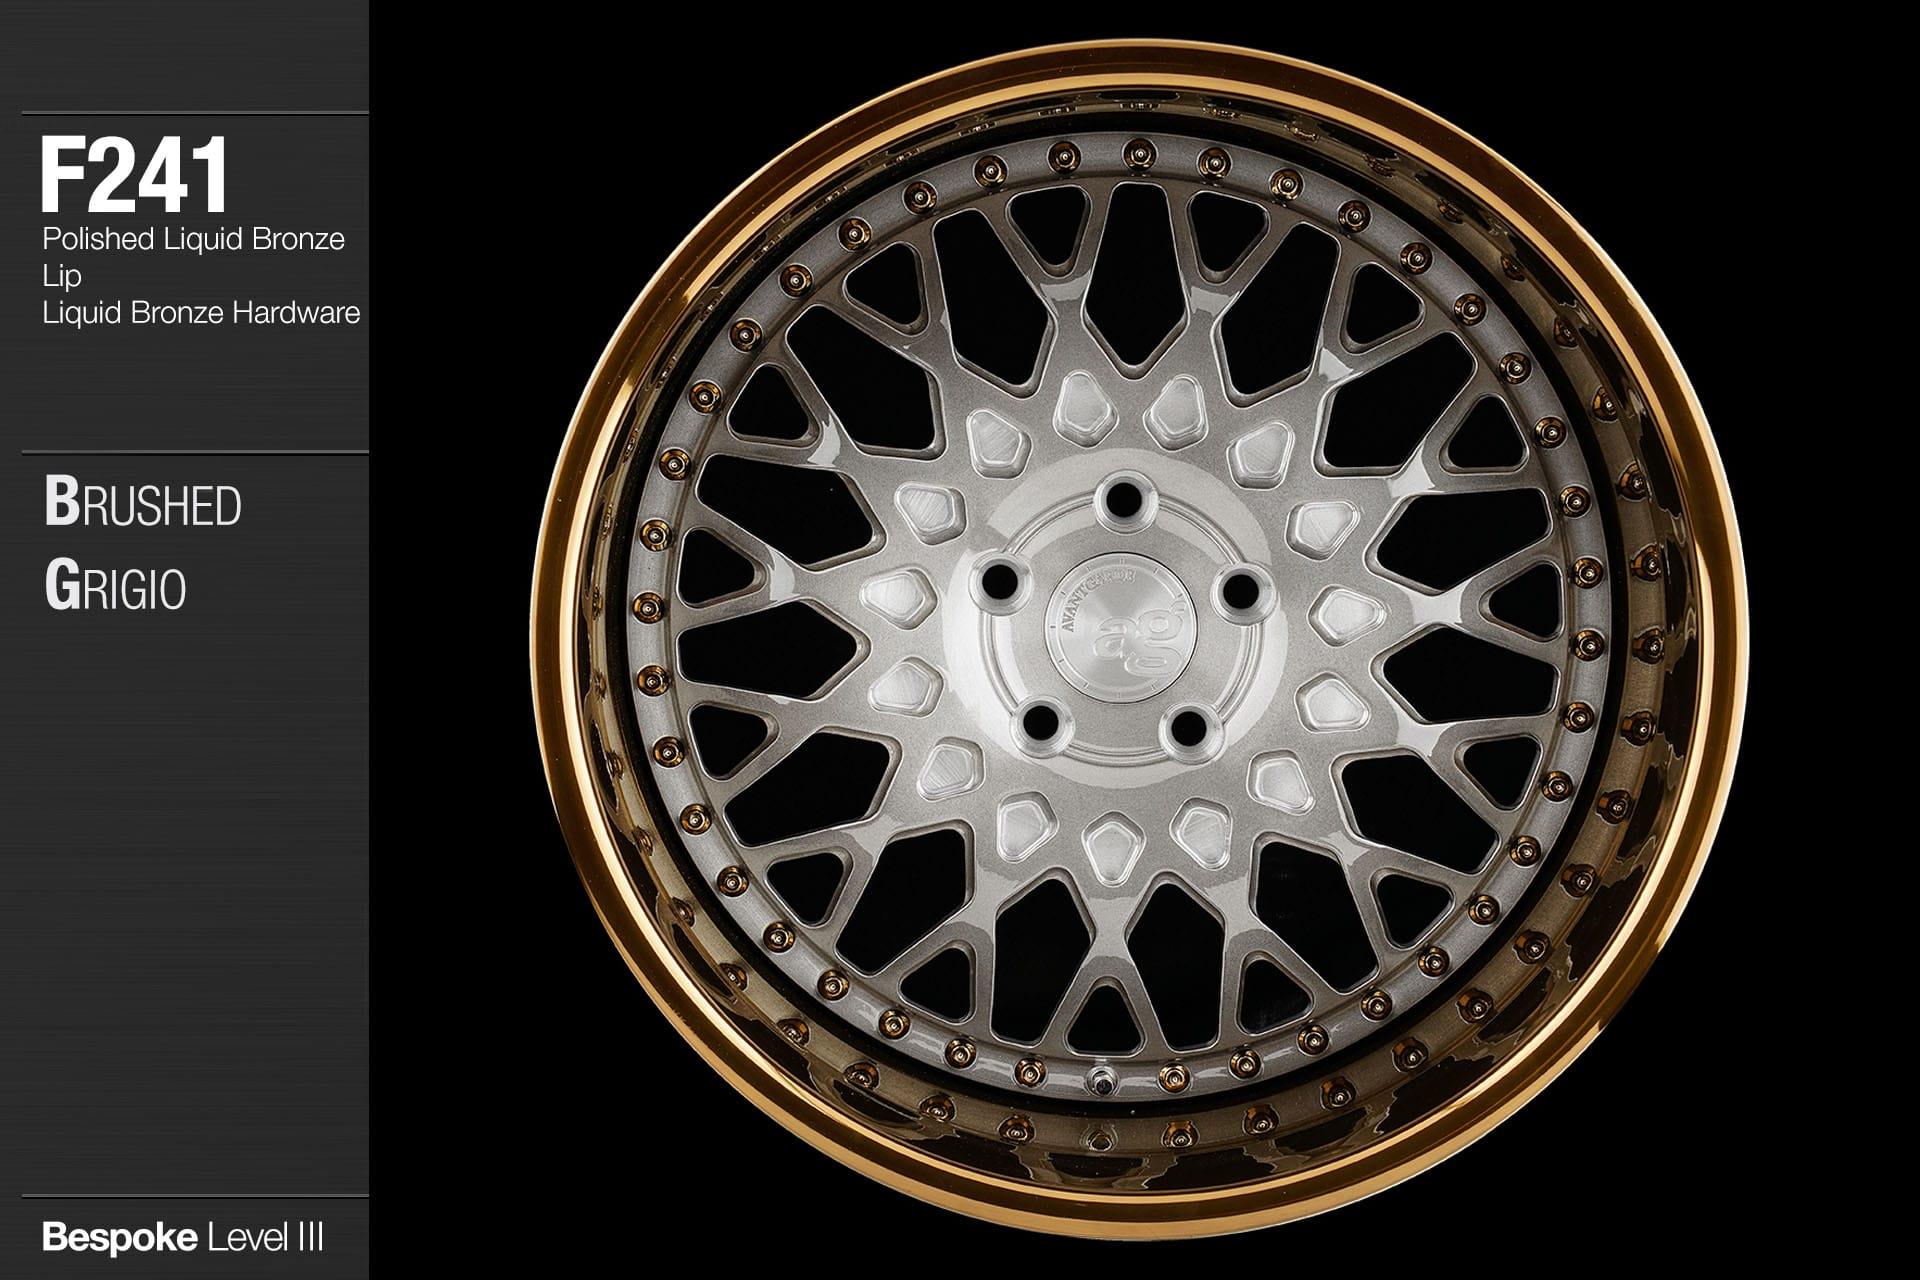 avant-garde-ag-wheels-f241-brushed-grigio-face-polished-liquid-bronze-lip-hardware-1-min